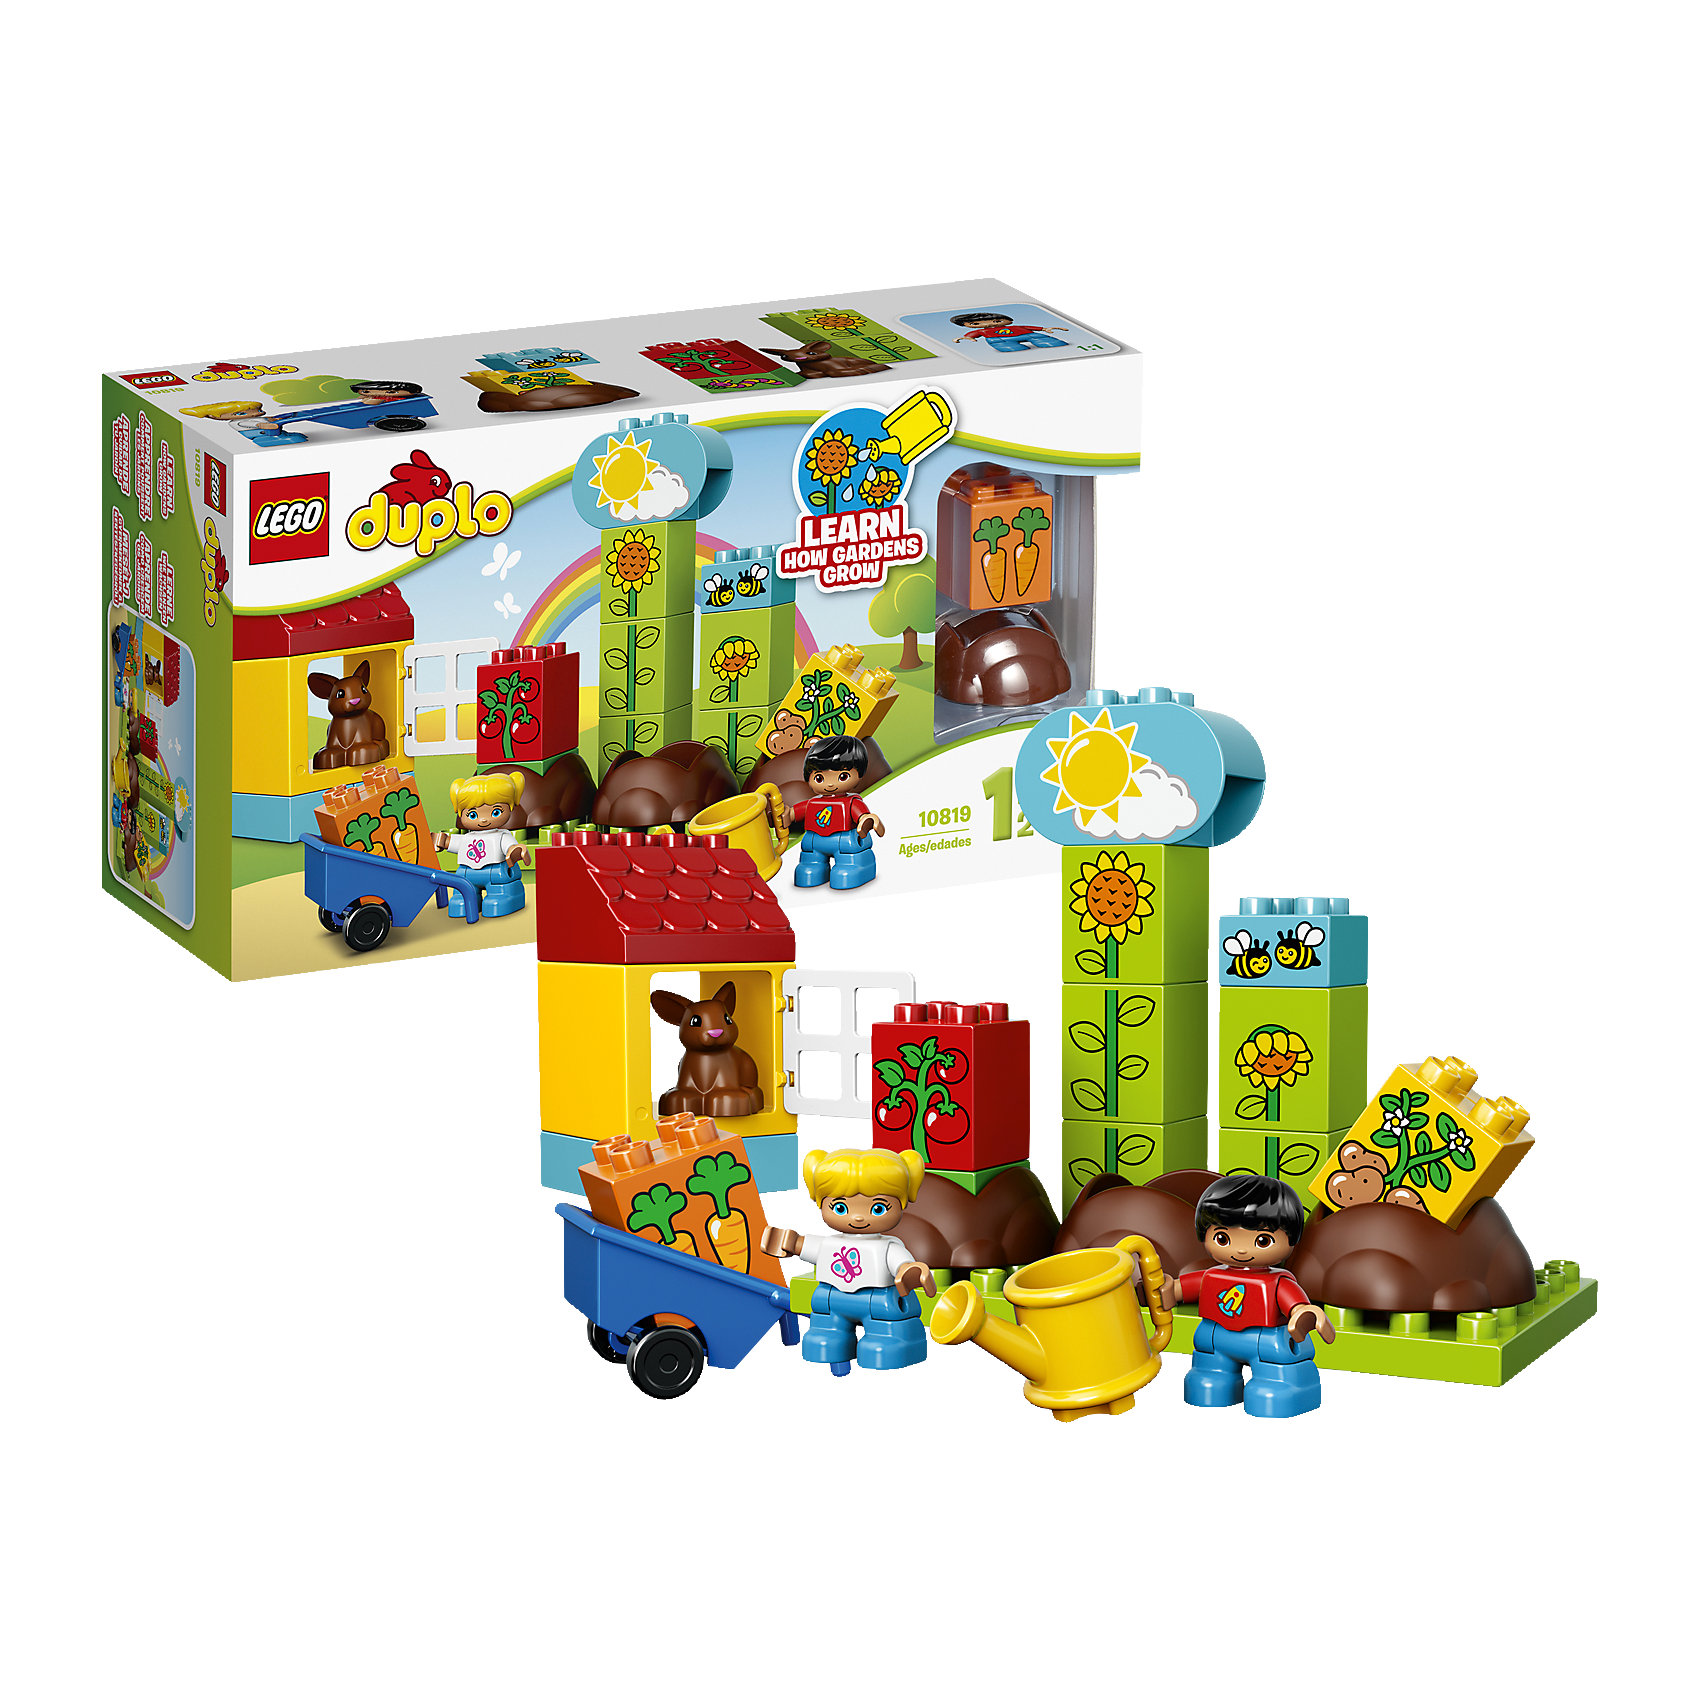 LEGO LEGO DUPLO 10819: Мой первый сад